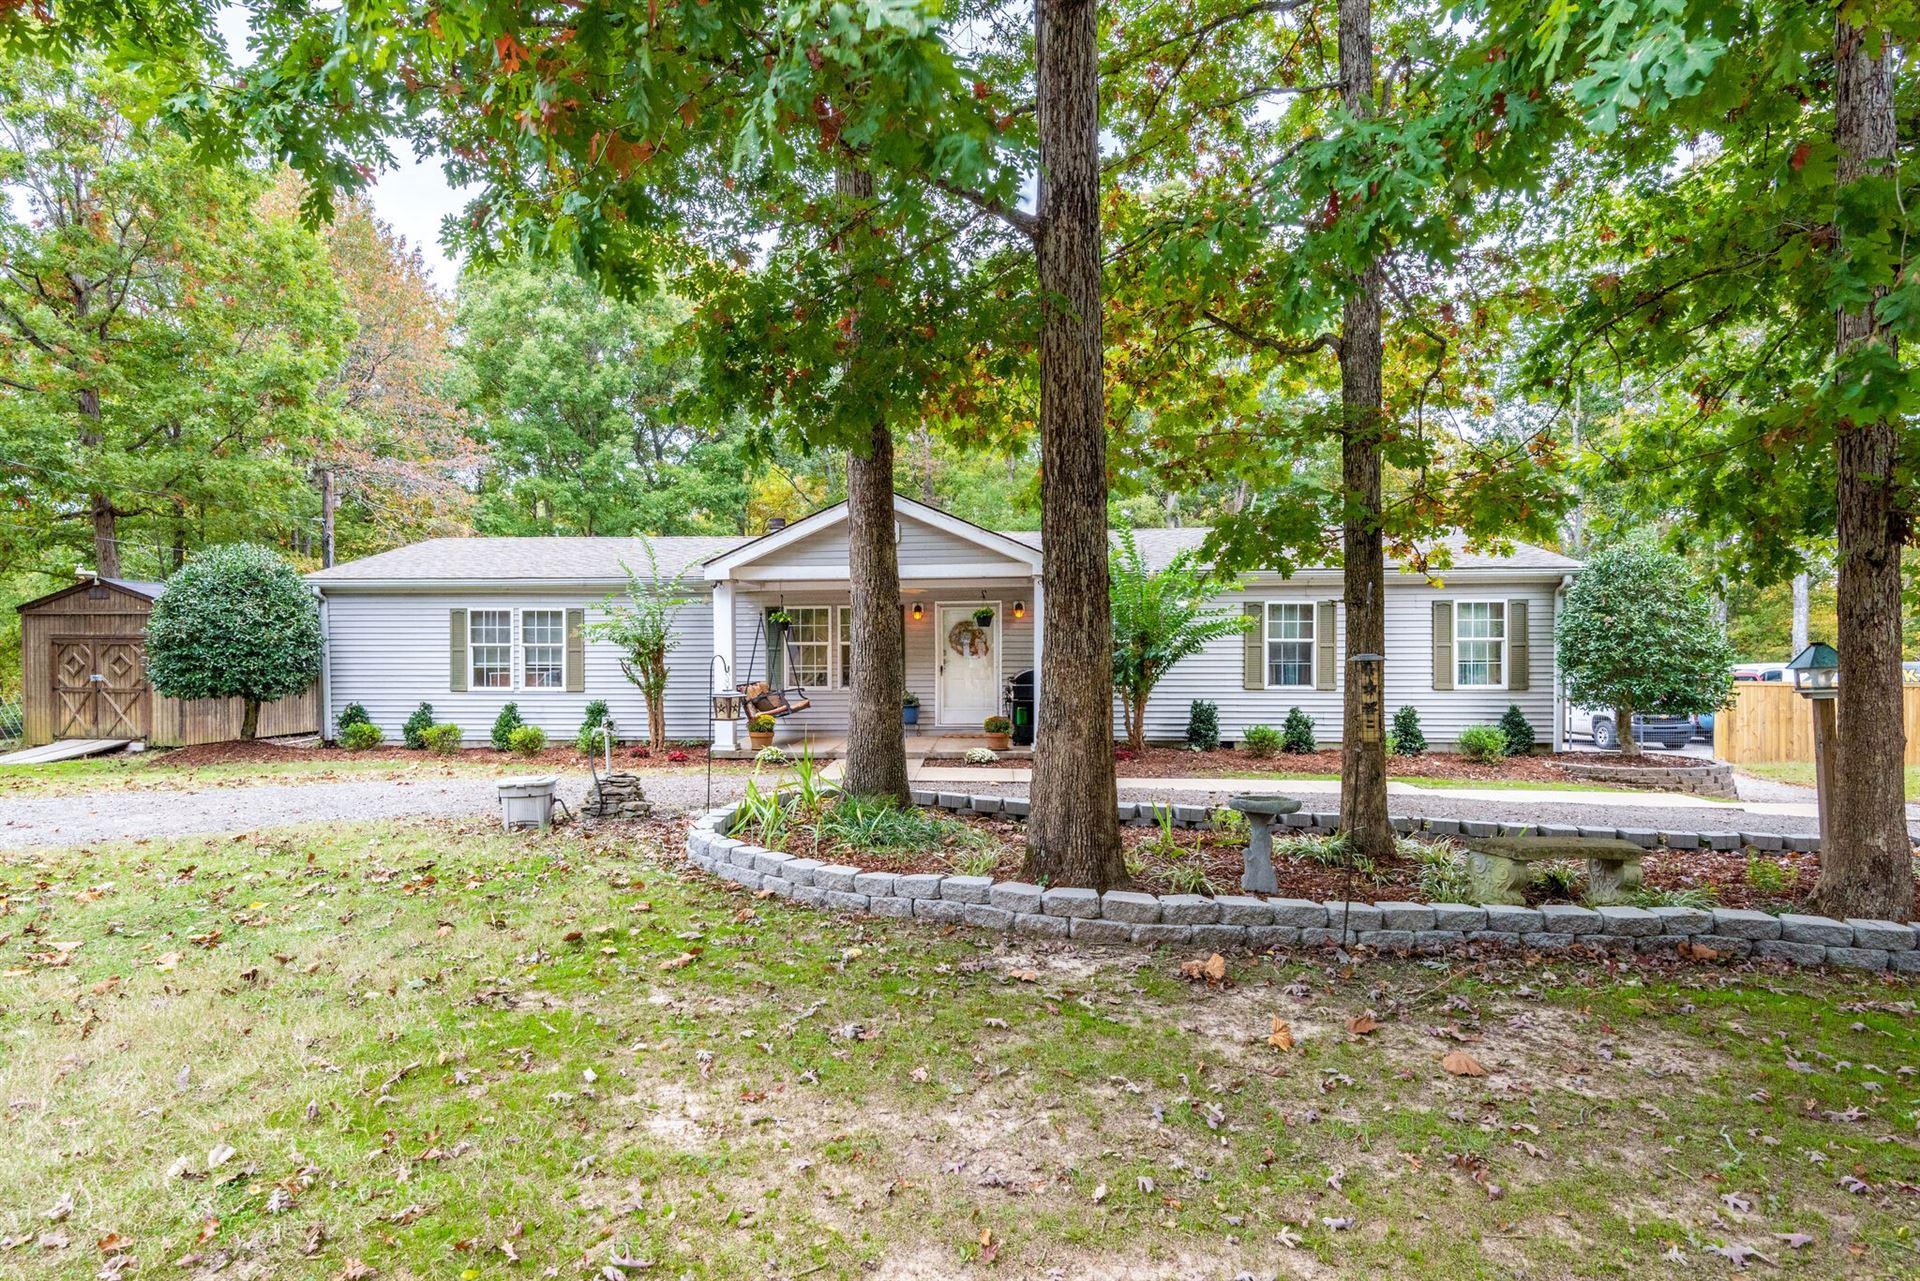 4889 Old Sams Creek Rd, Pegram, TN 37143 - MLS#: 2199204